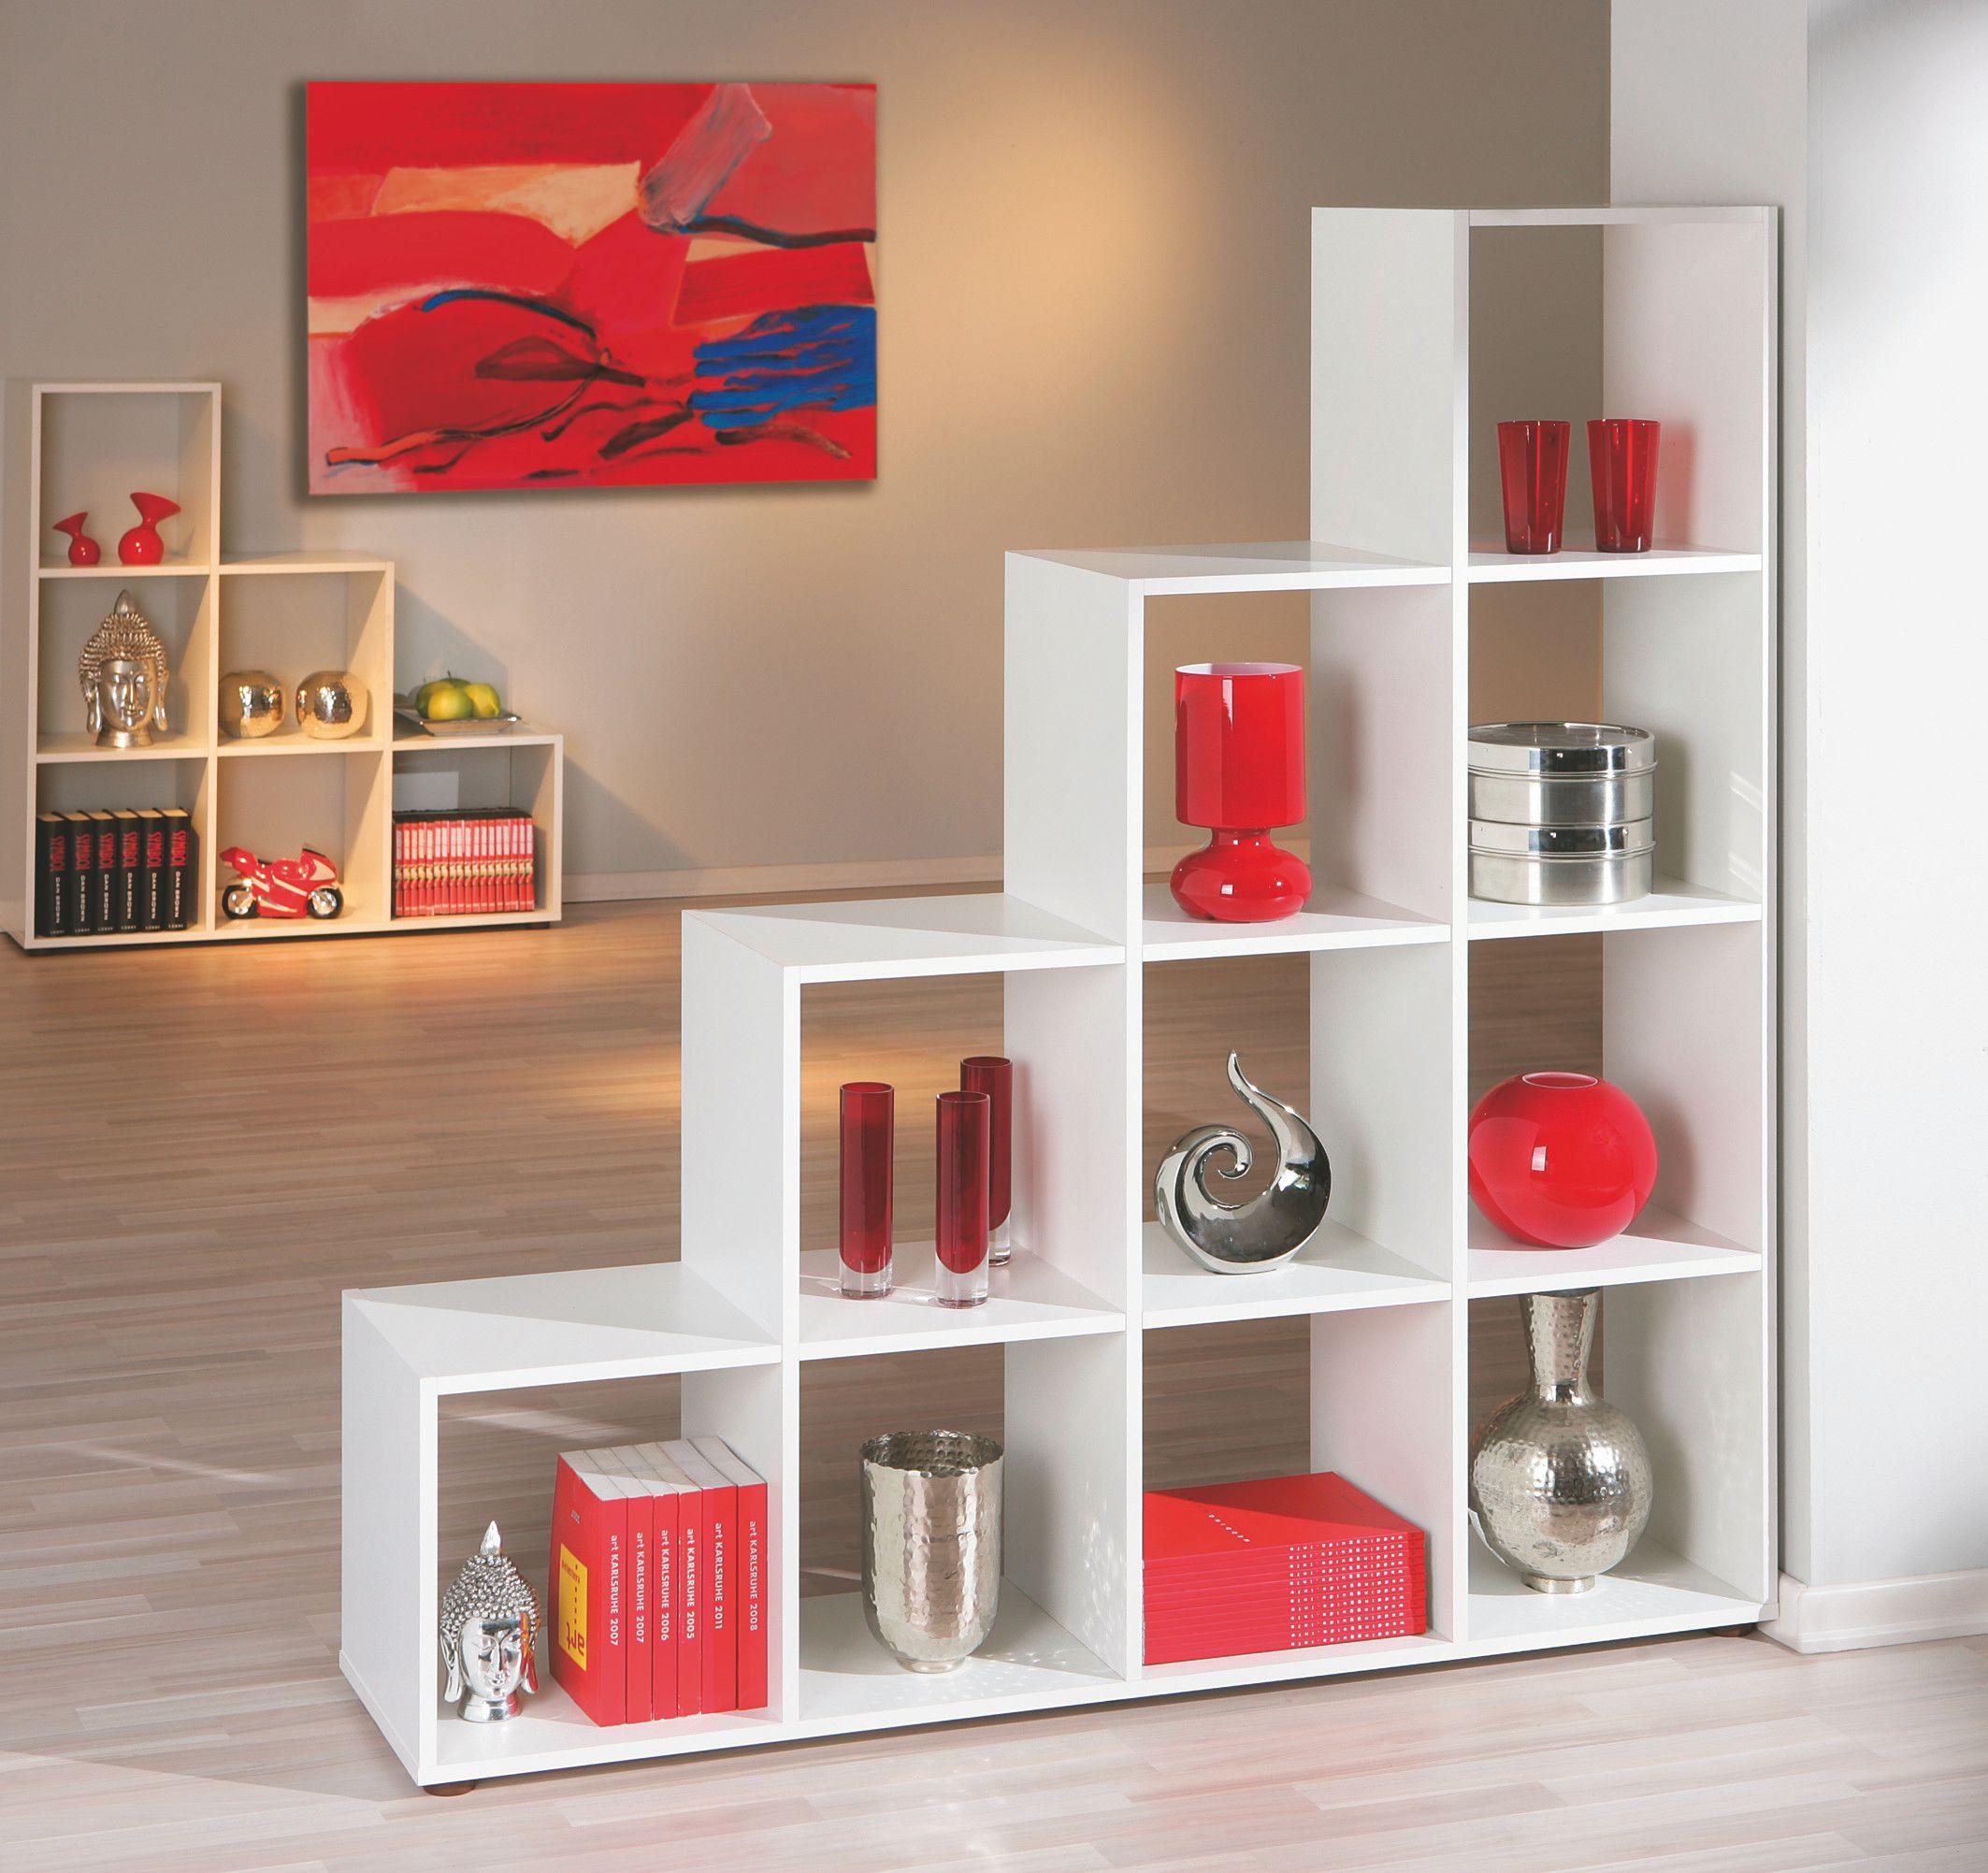 Raumteiler Weiss Woody 148 00101 Modern Jetzt Bestellen Unter Moebel